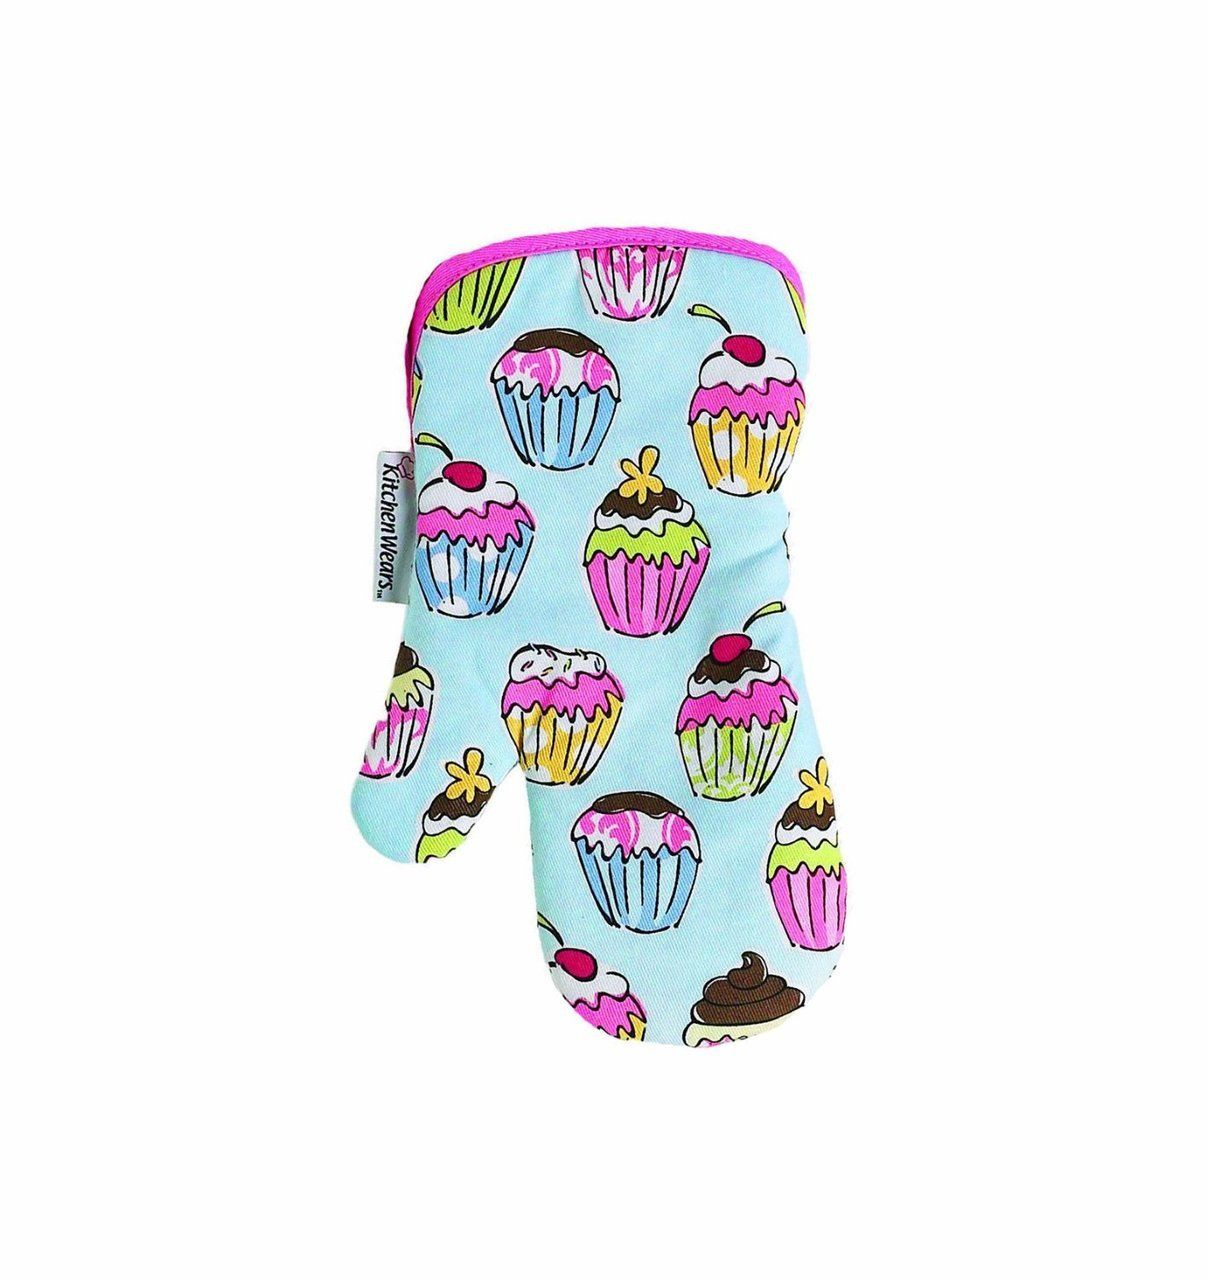 RITZ Cupcakes Oven Mitt $9.95 Out The Door! TOTAL PRICE OUT THE DOOR ...